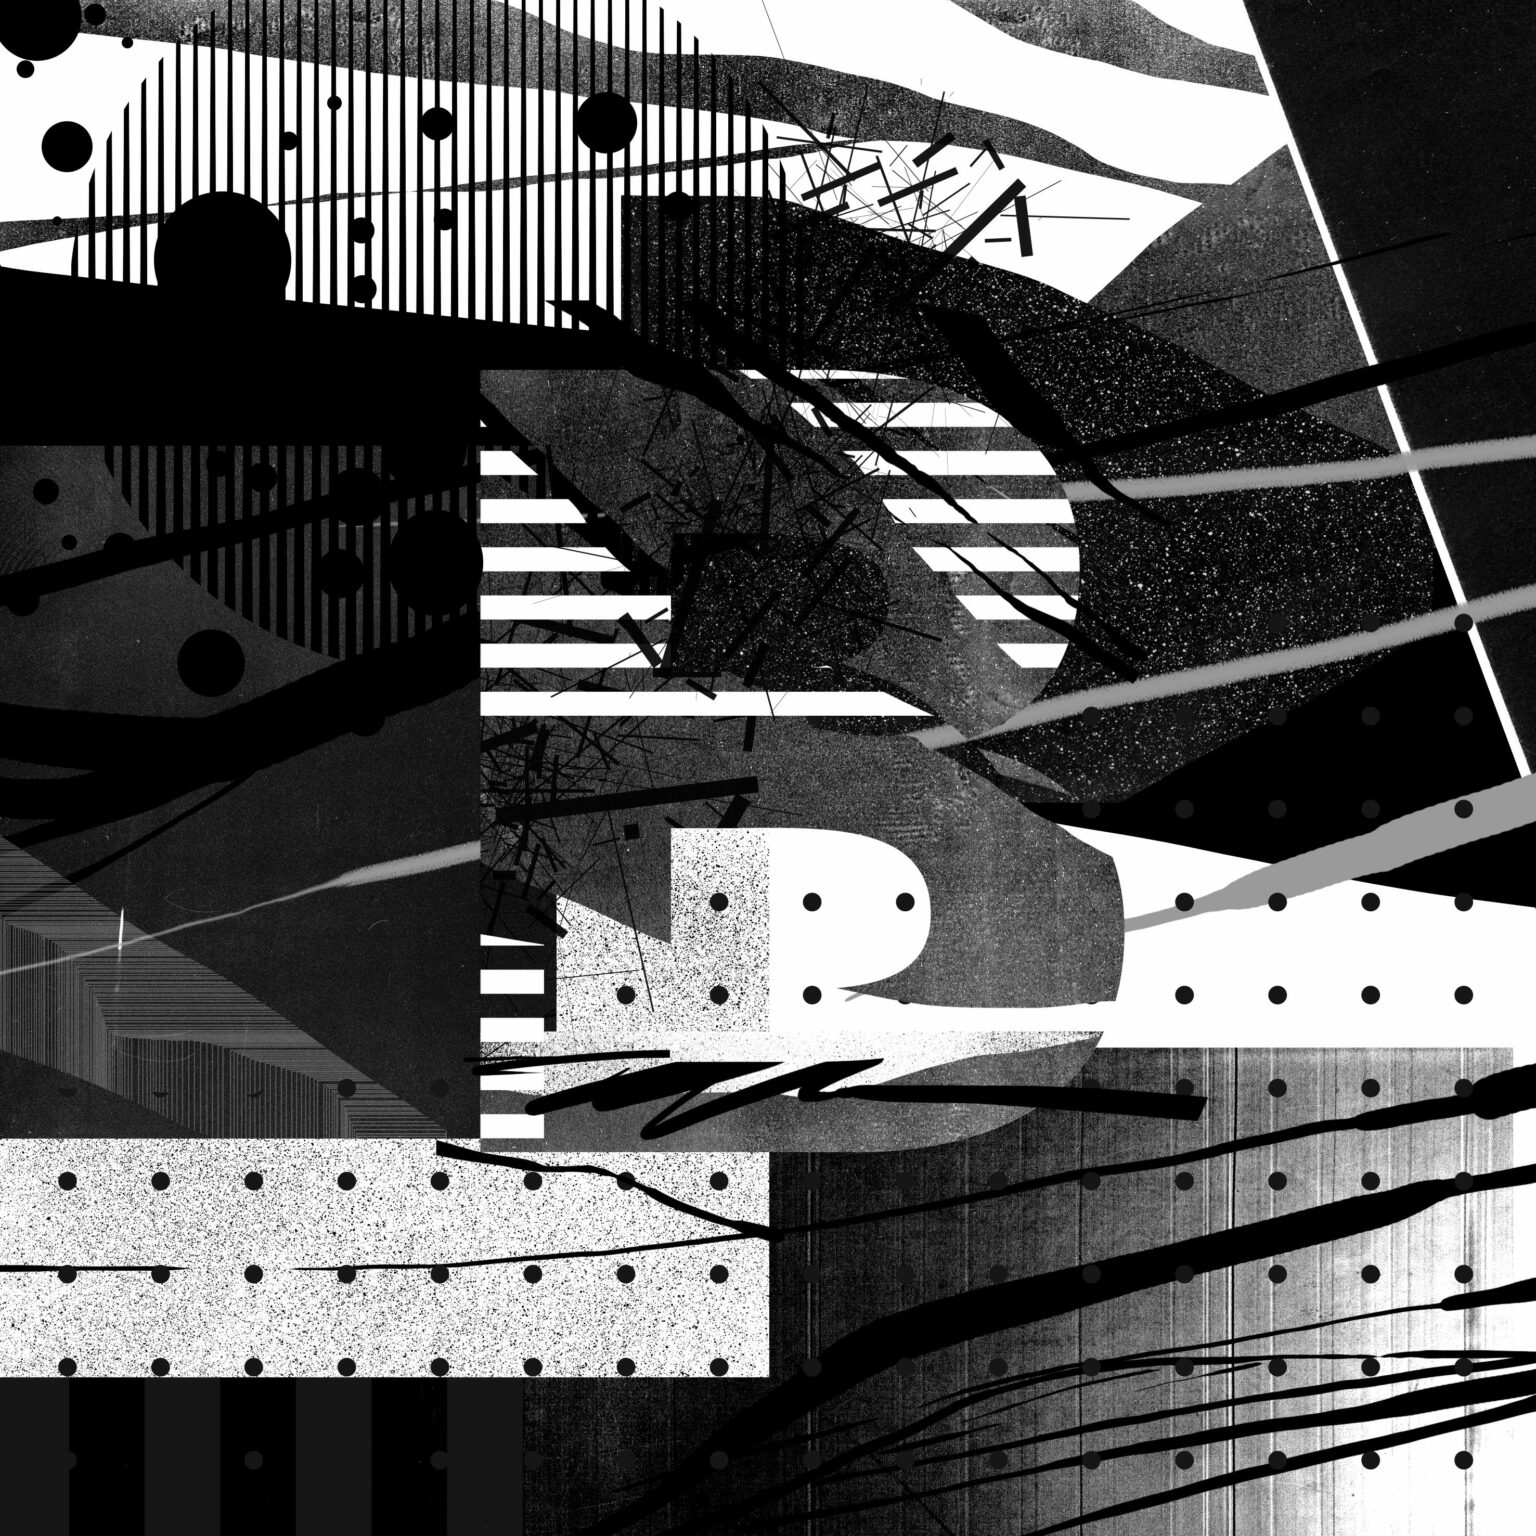 ATC Artist Series Blasto Uno Letter B